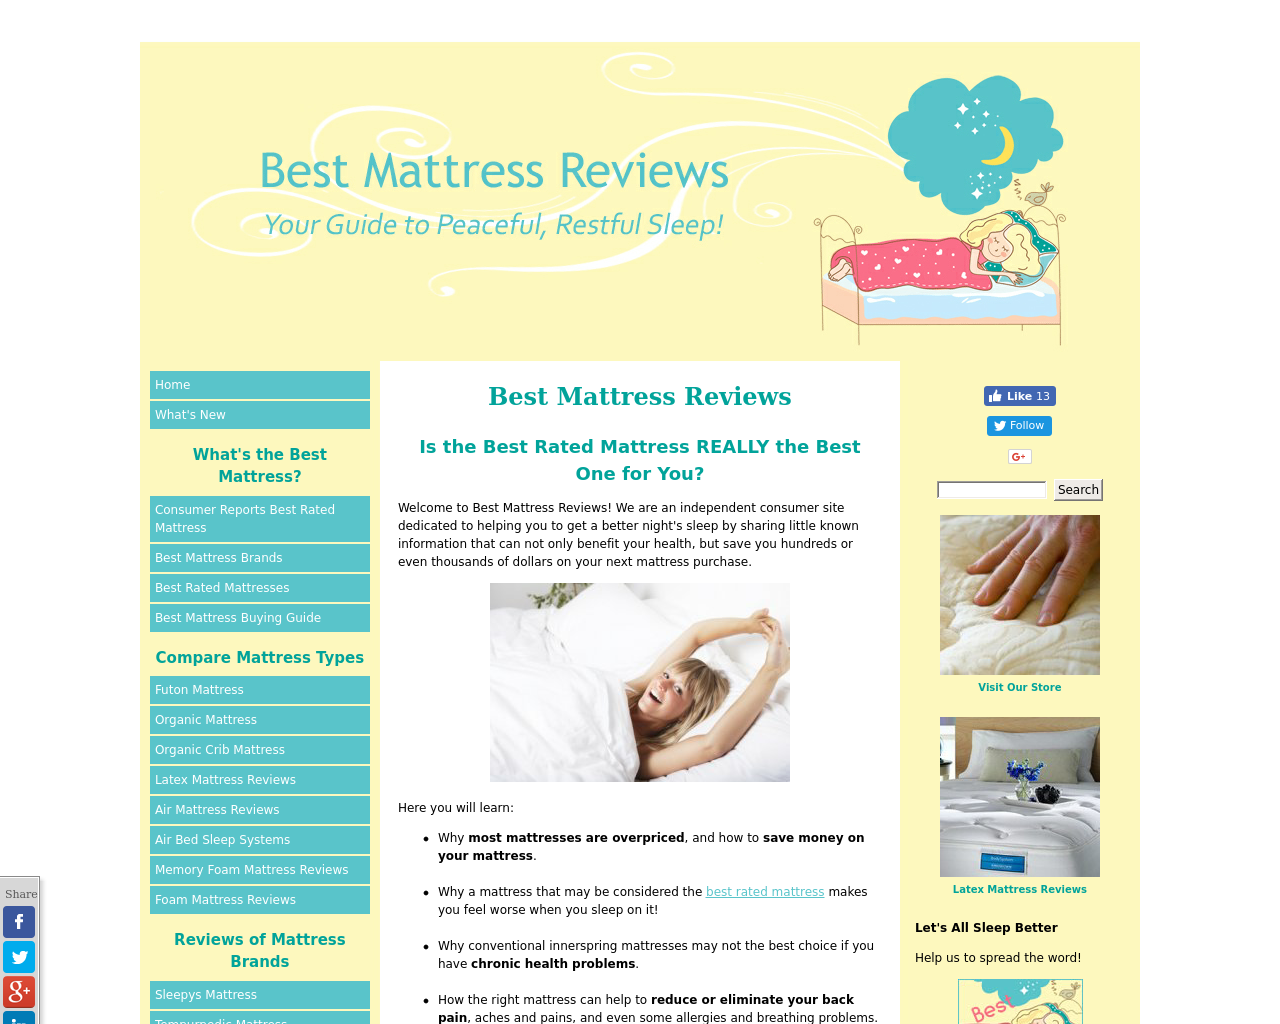 Best-mattress-reviews.com-Advertising-Reviews-Pricing